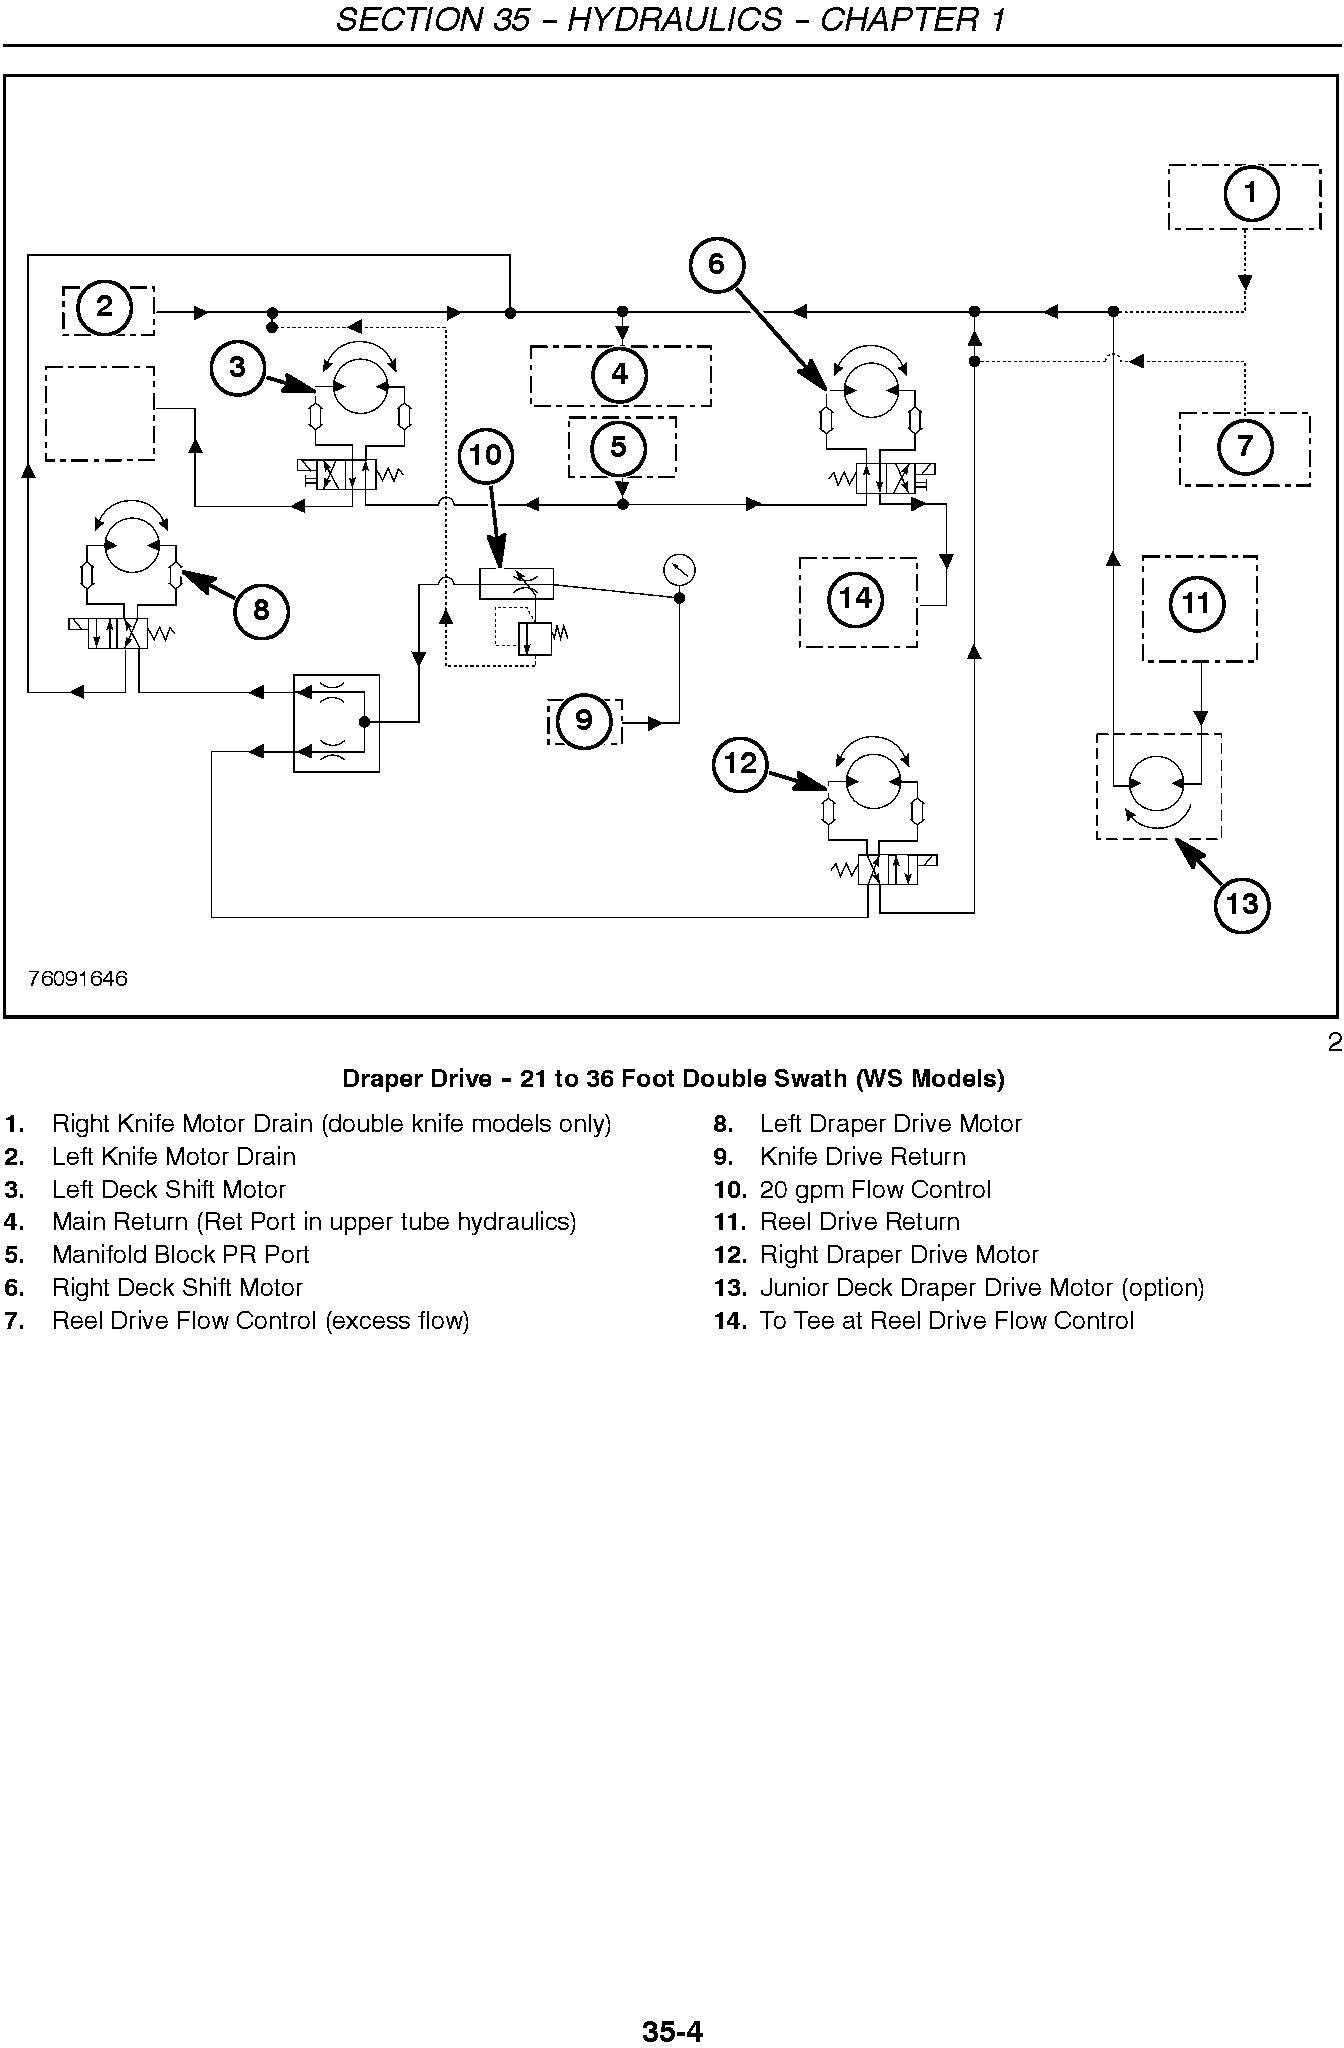 New Holland 18HB, 21HB, 25HB, 30HB, 36HB Draper Headers Service Manual - 1